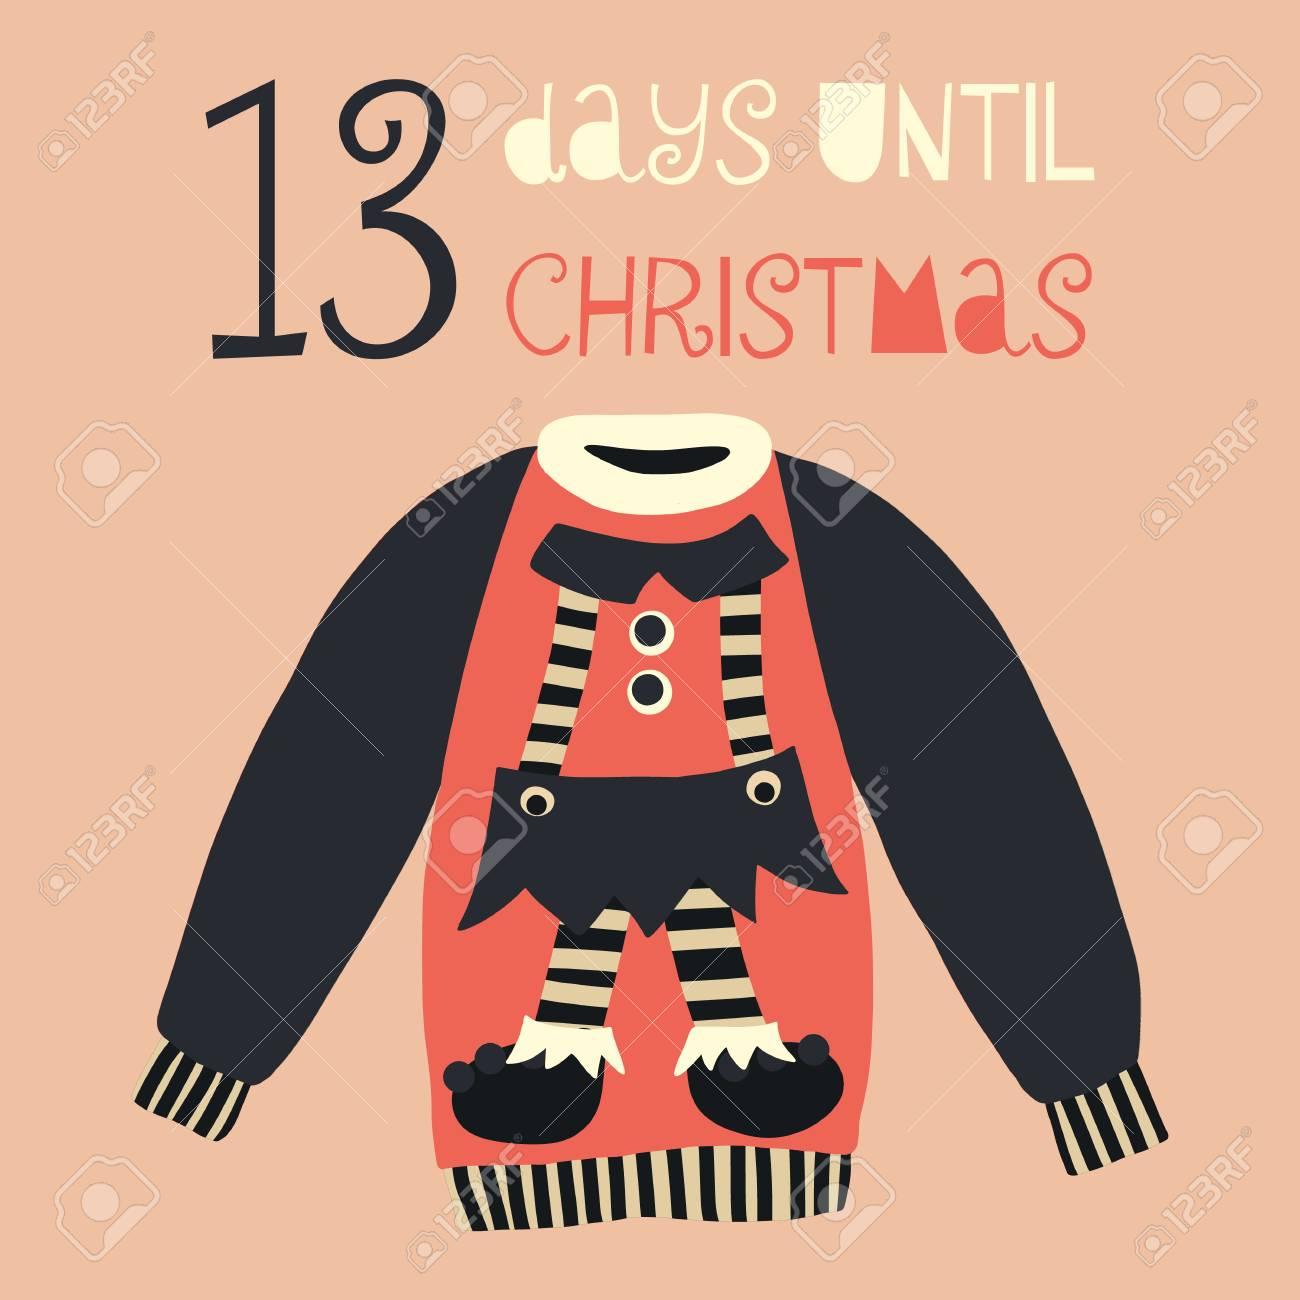 925ee3702ad3 13 Days Until Christmas Vector Illustration. Christmas Countdown ...